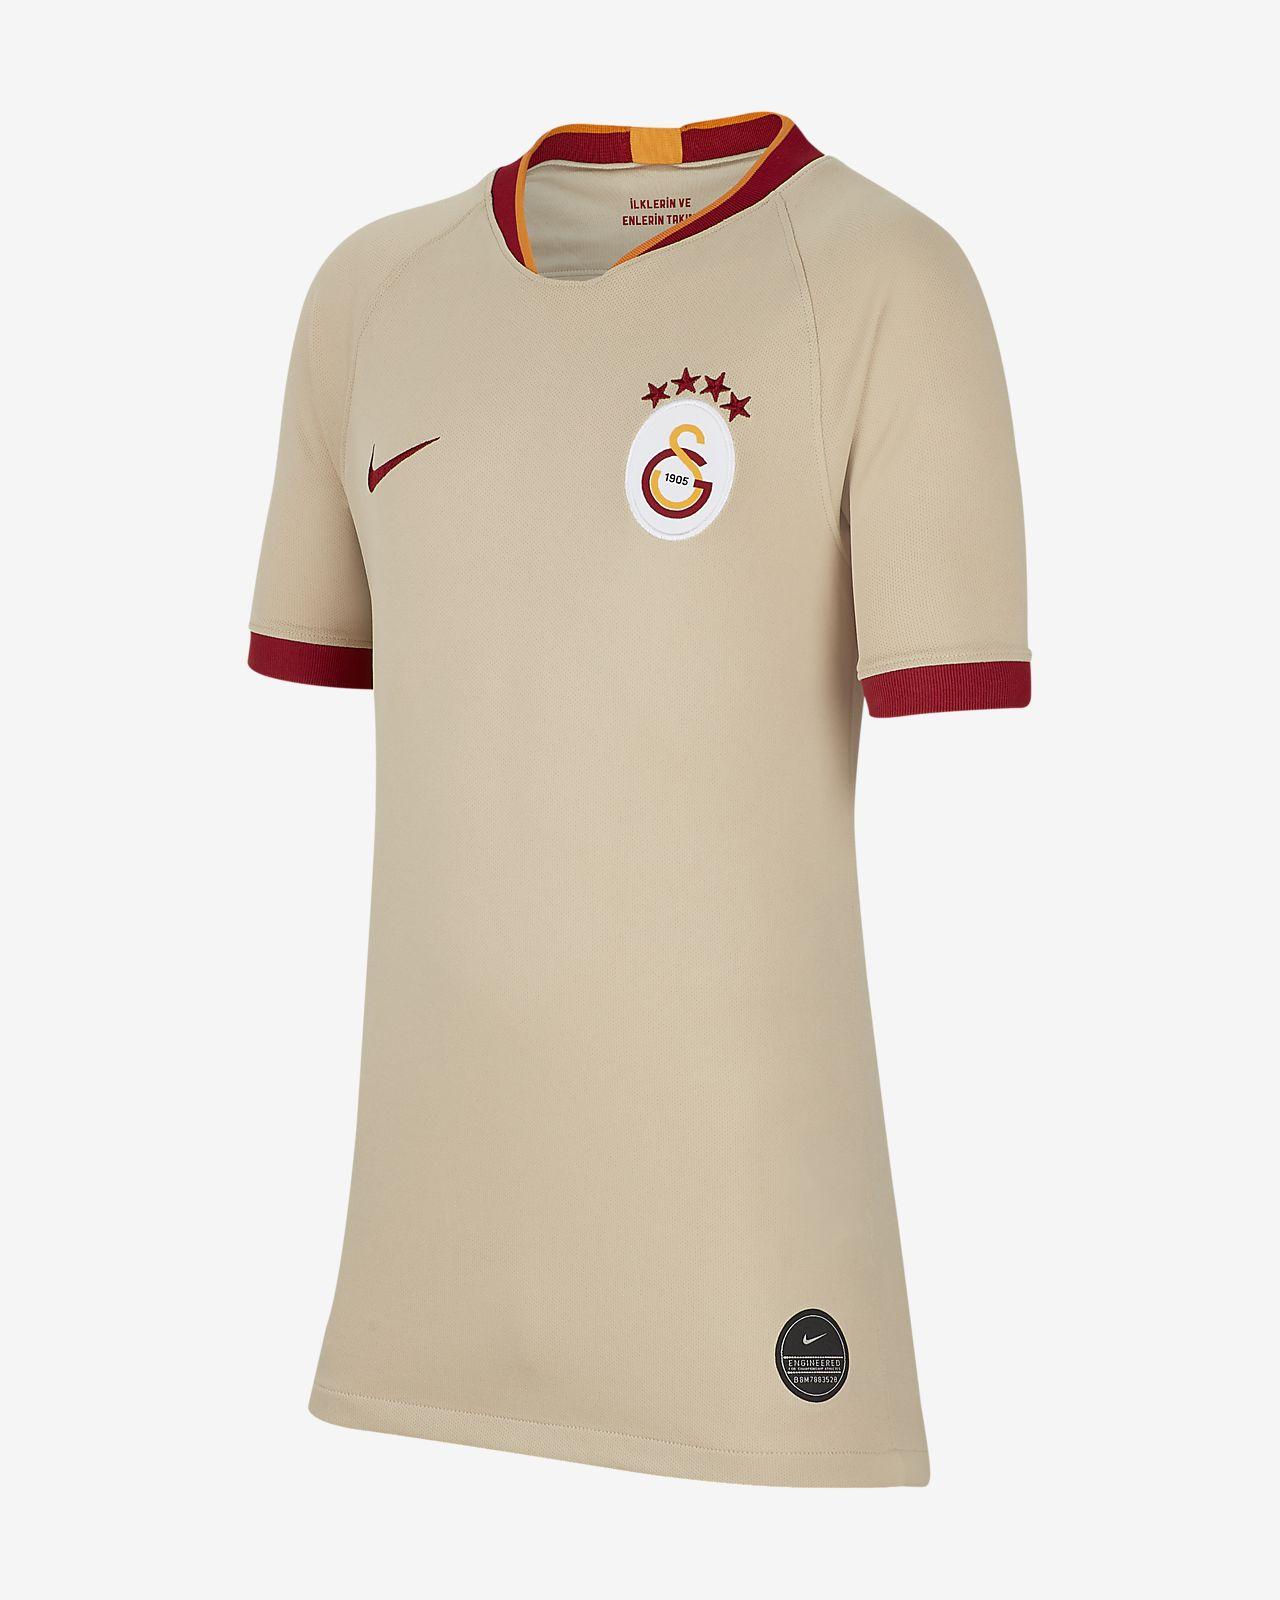 Camisola de futebol Galatasaray 2020 Stadium Away Júnior